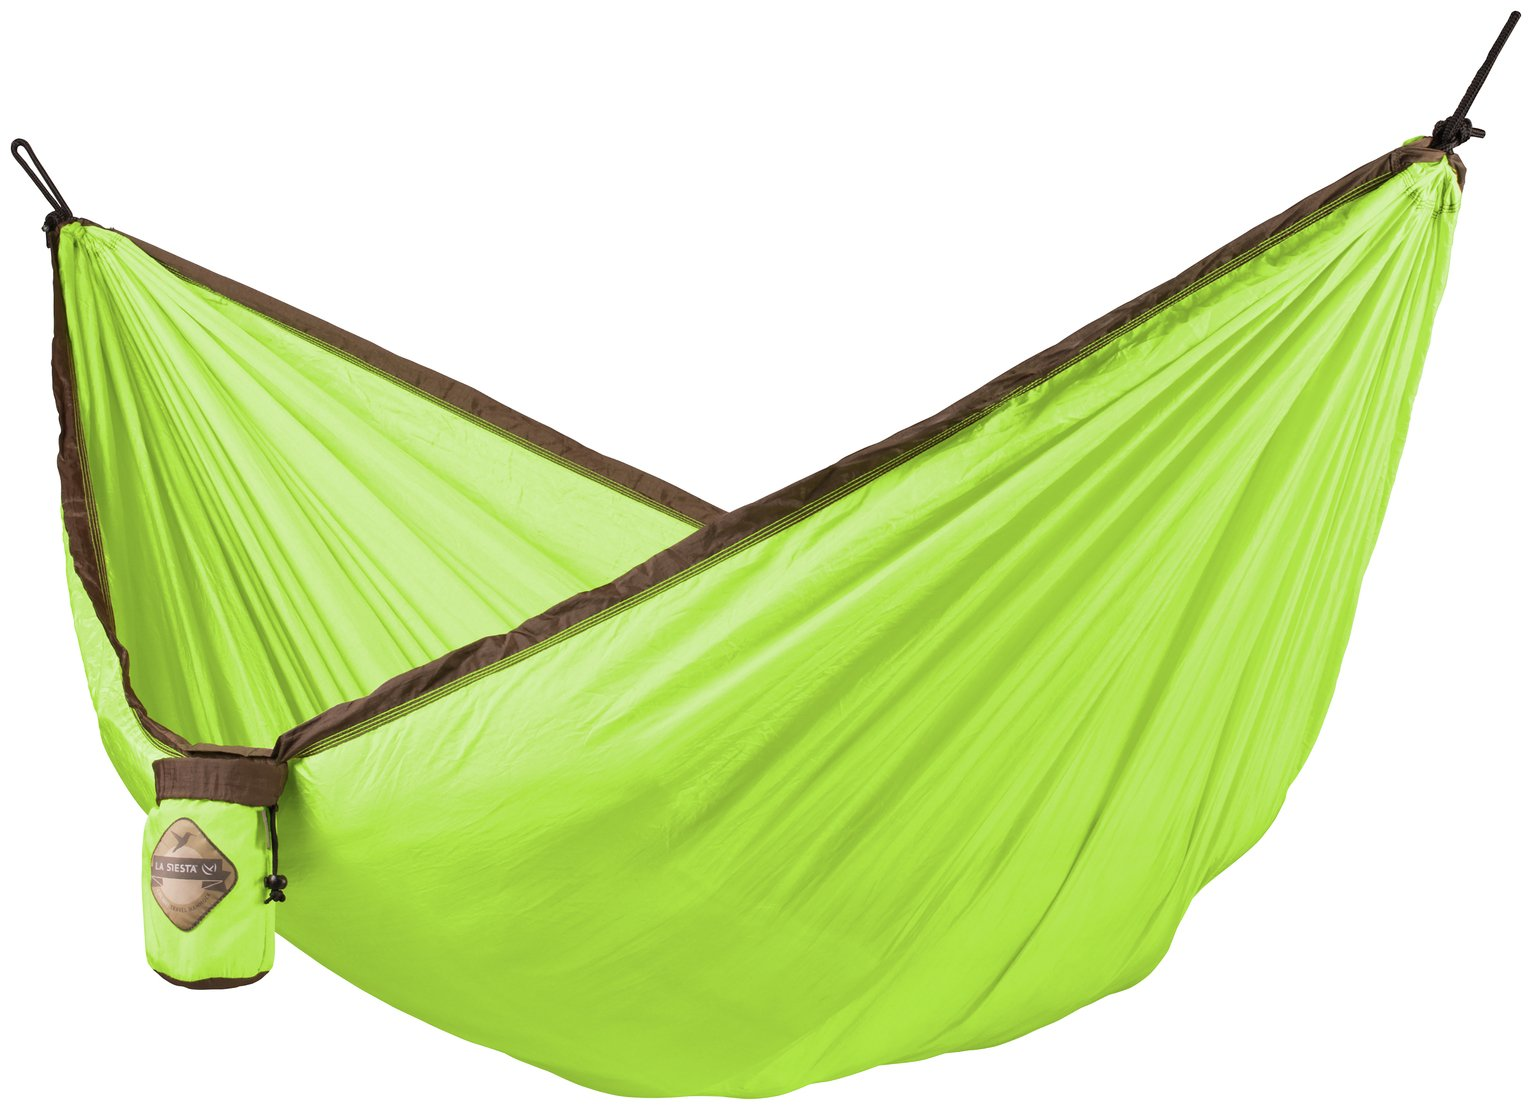 La Siesta Single Travel Colibri Hammock - Green